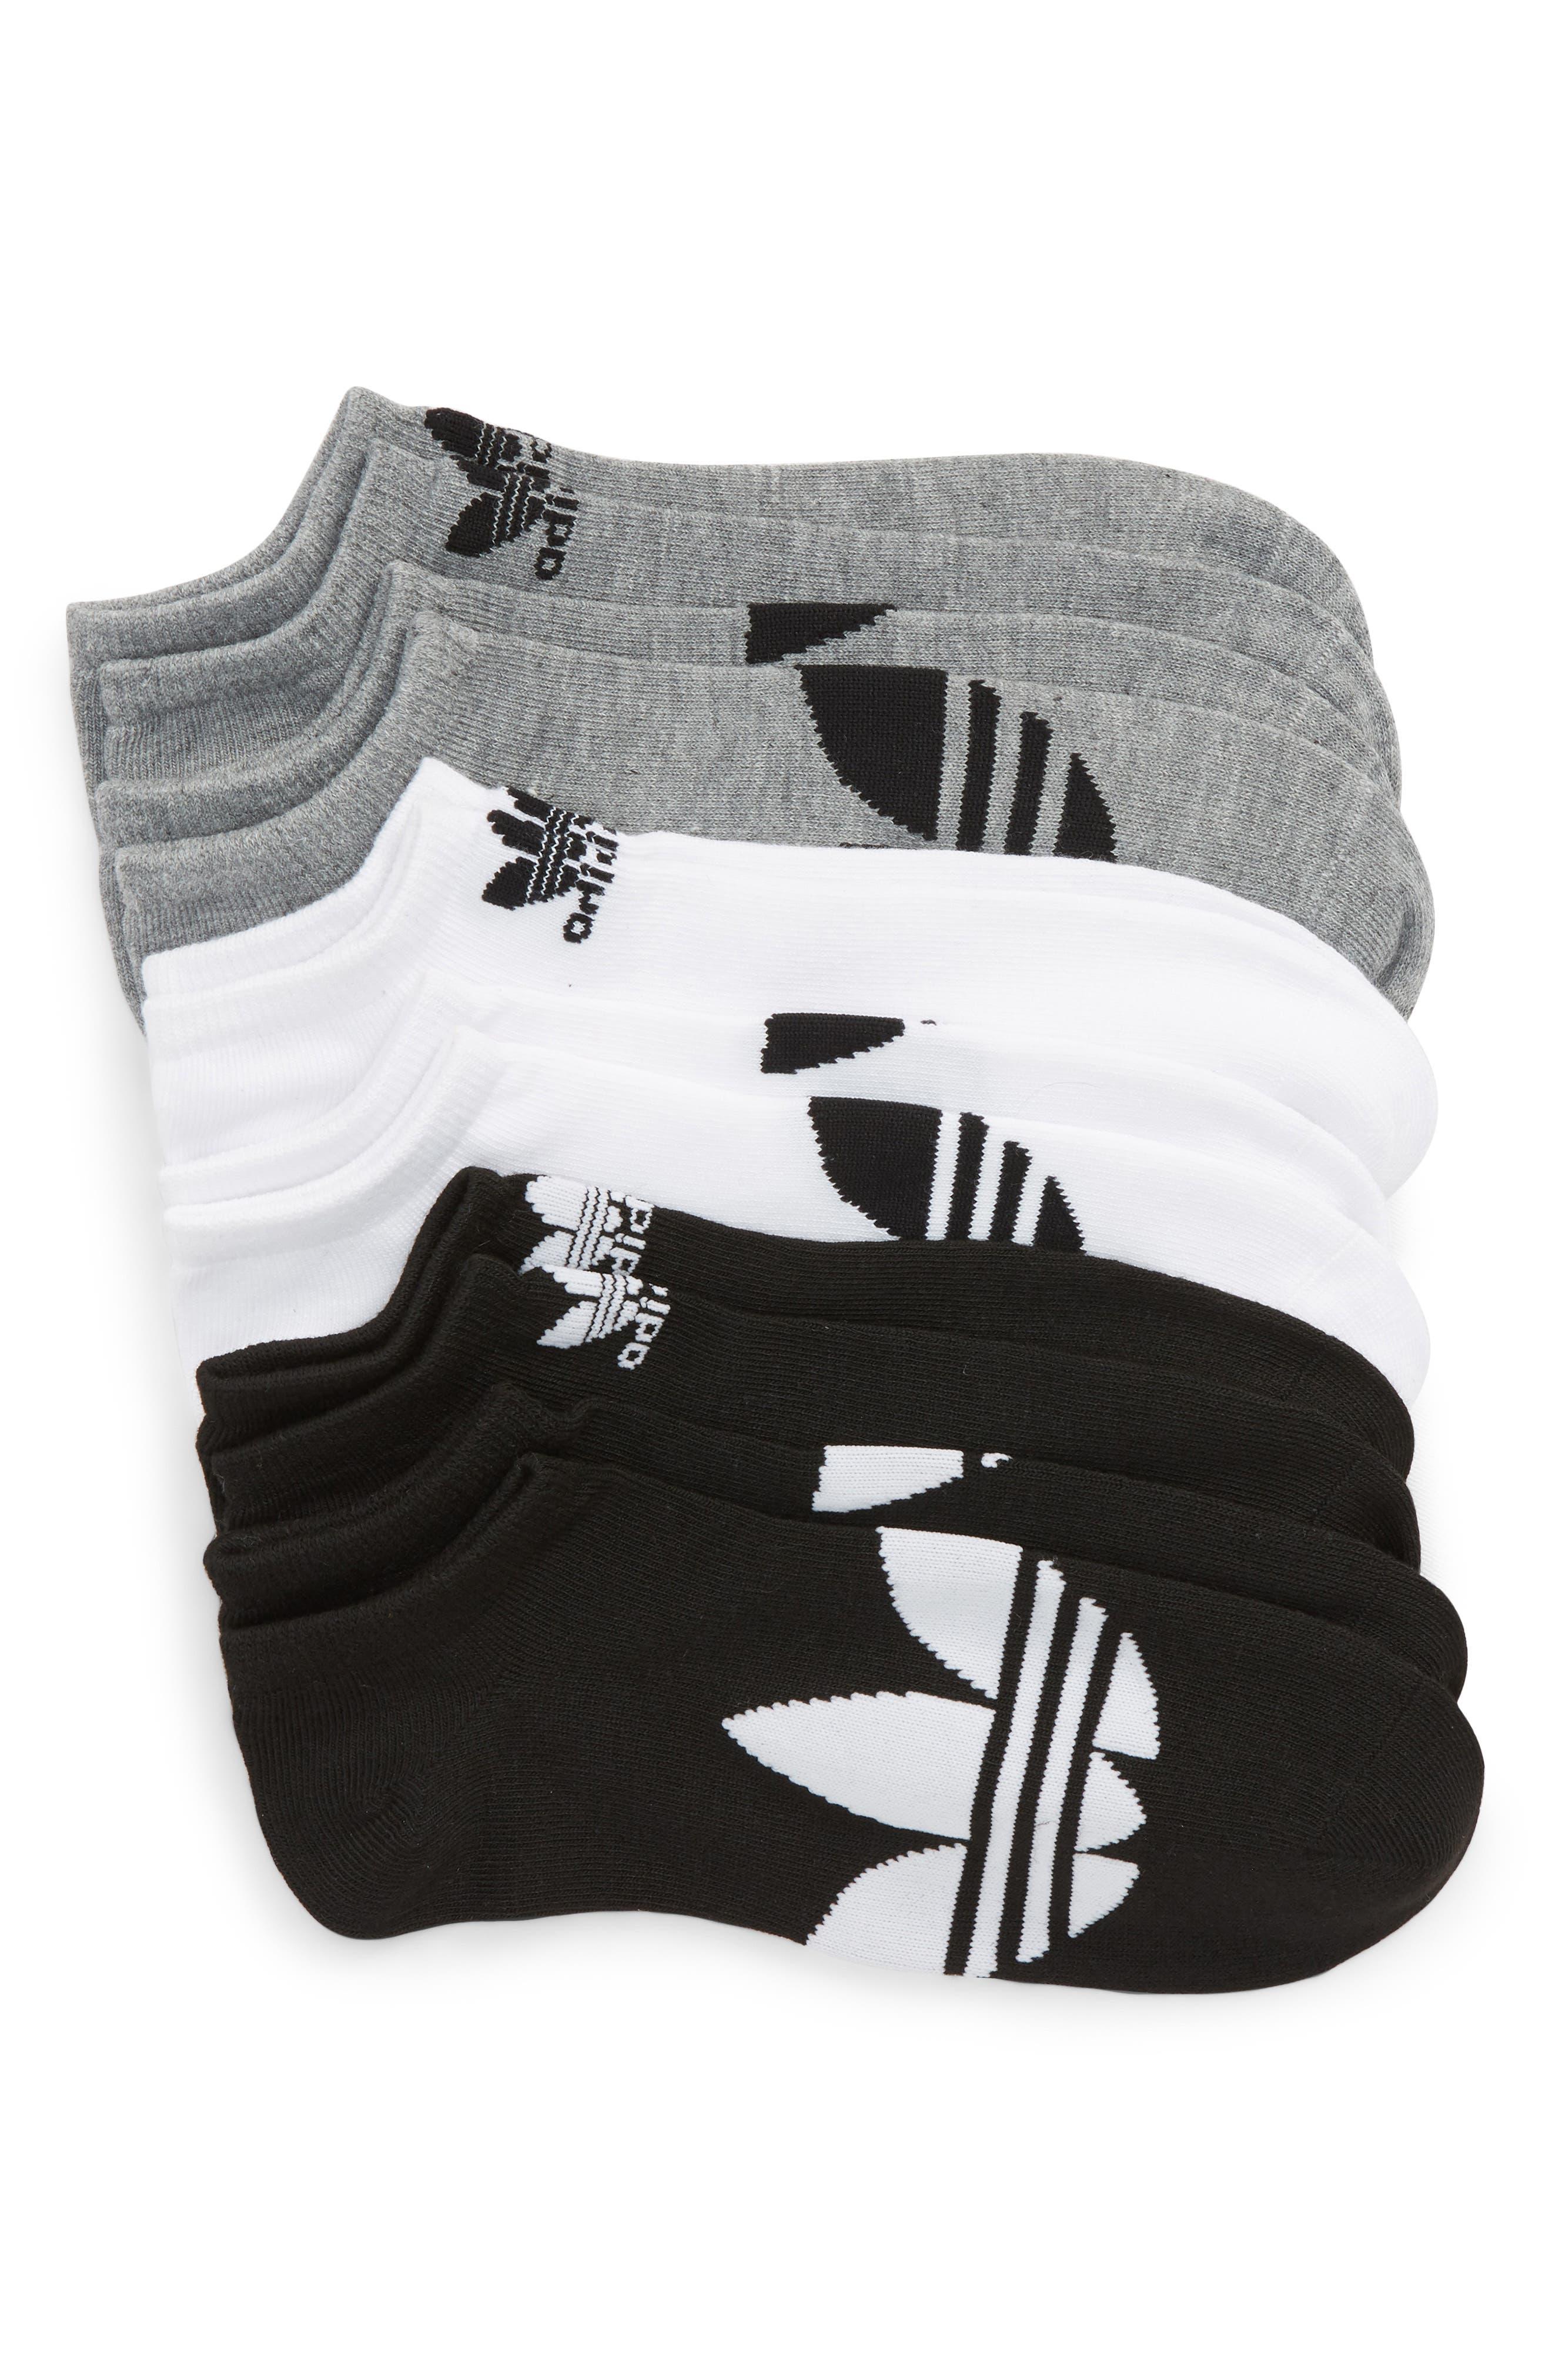 ADIDAS ORIGINALS, 6-Pack No-Show Socks, Main thumbnail 1, color, BLACK/ WHITE/ HEATHER GREY